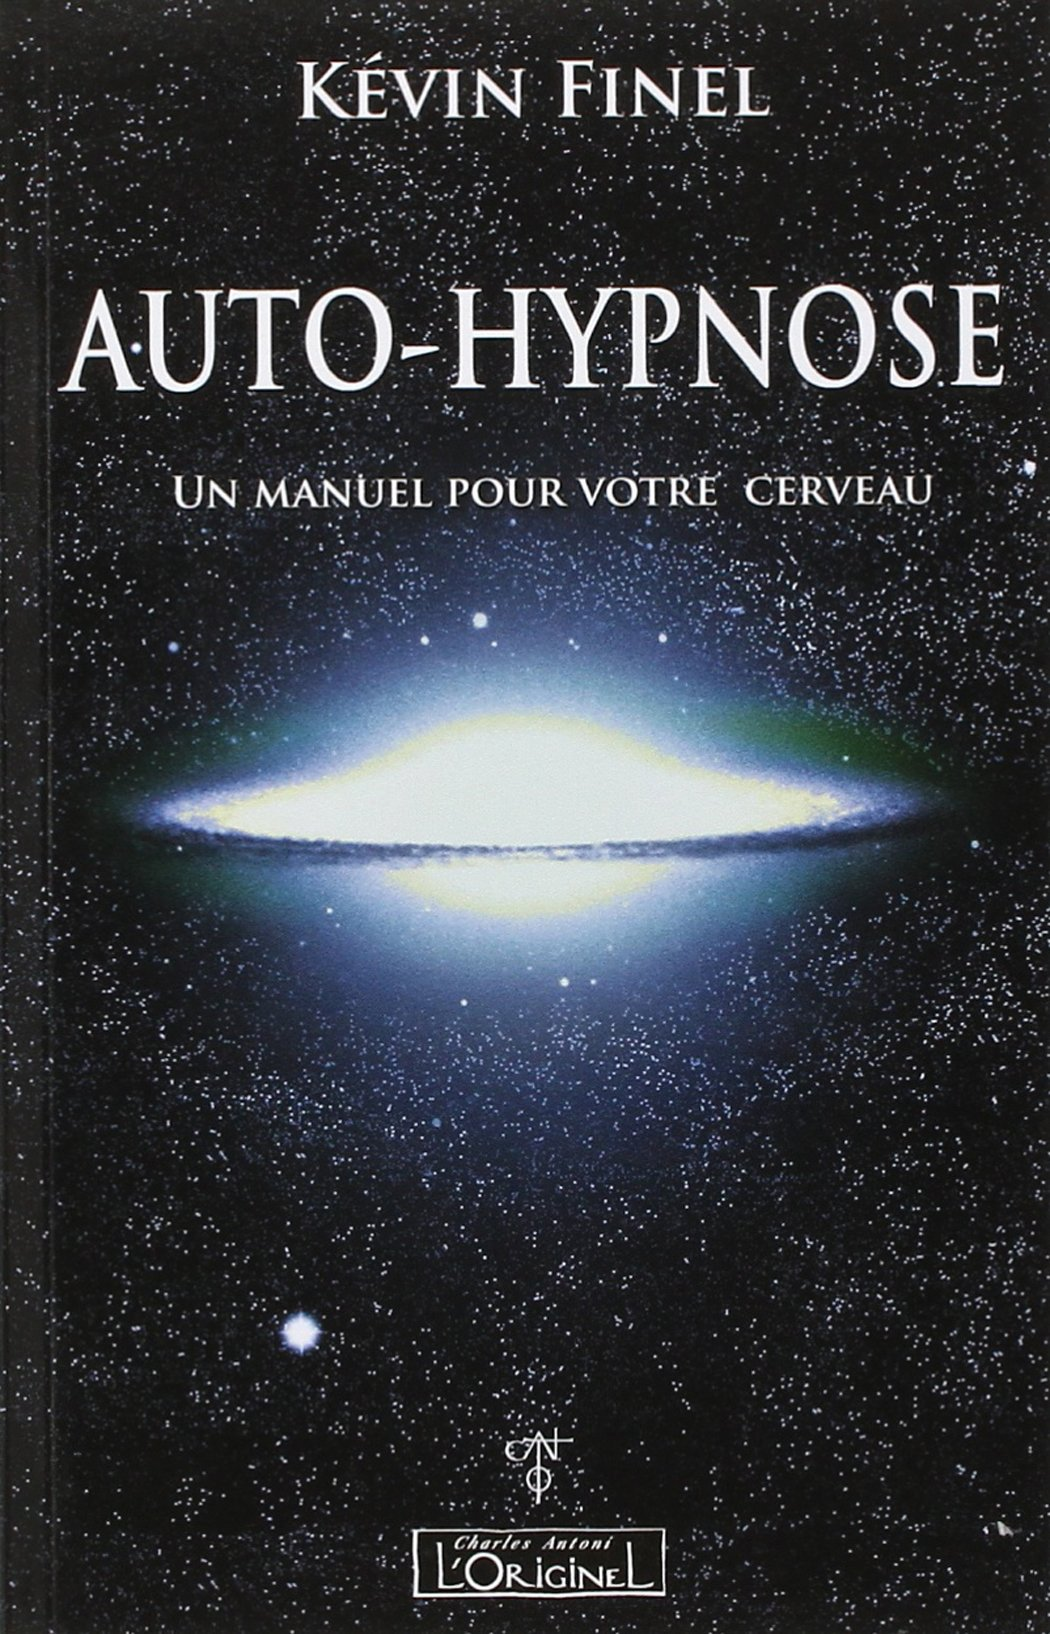 Découvrir l'hypnose à Tahiti